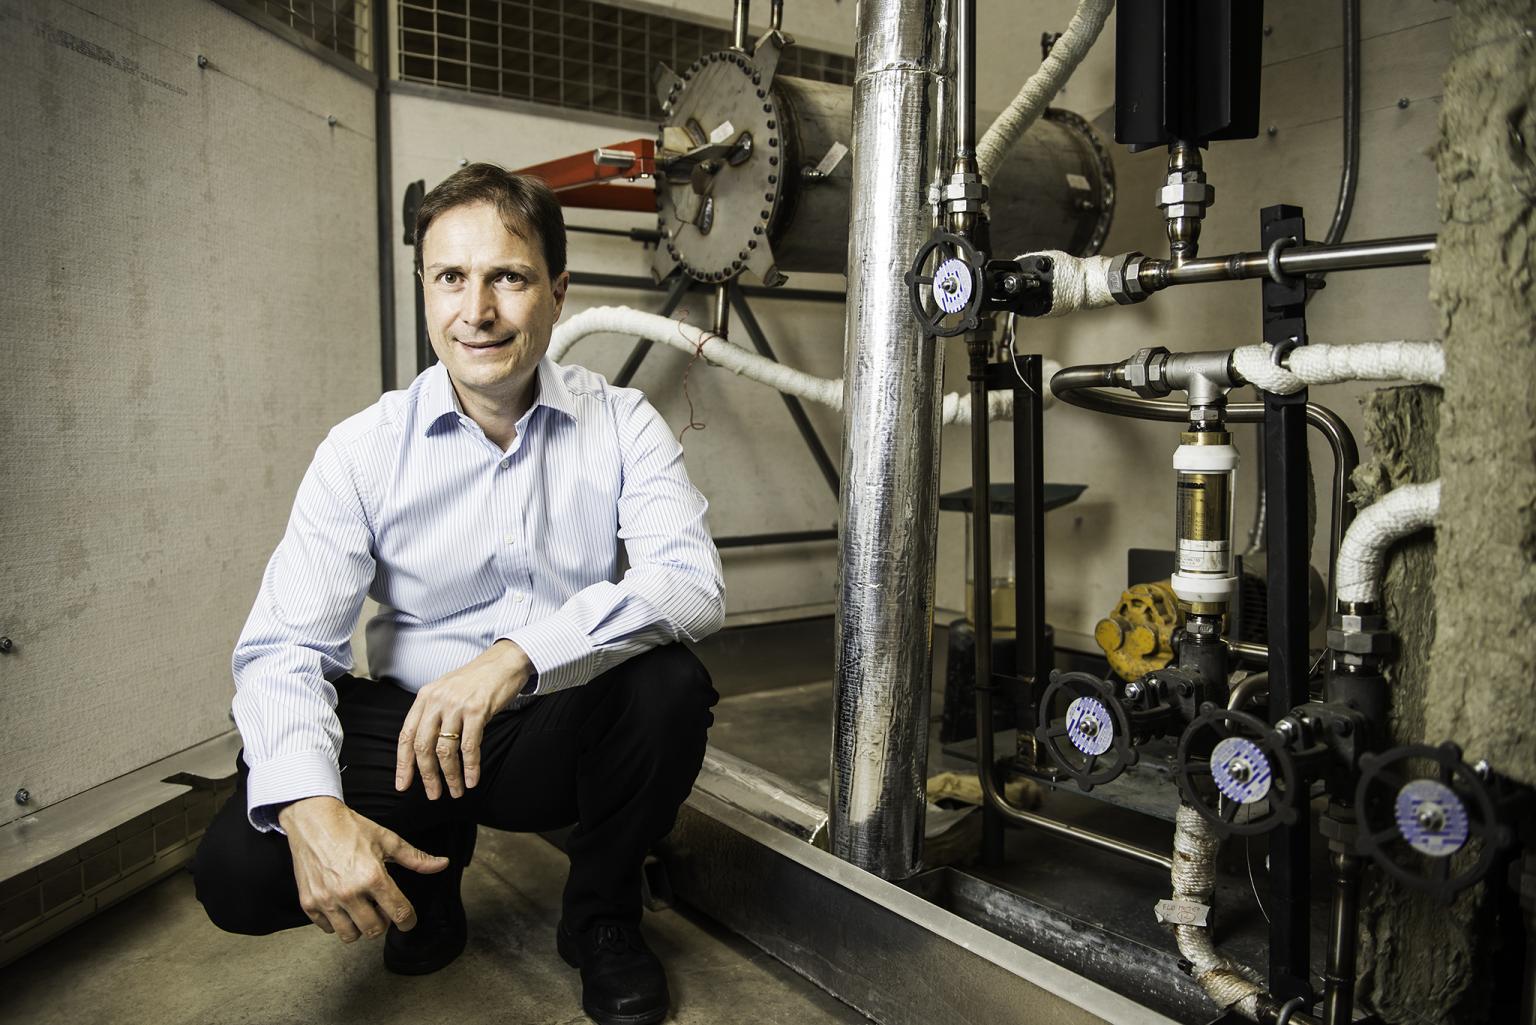 Professor Frank Bruno from University of South Australia, specialist equipment